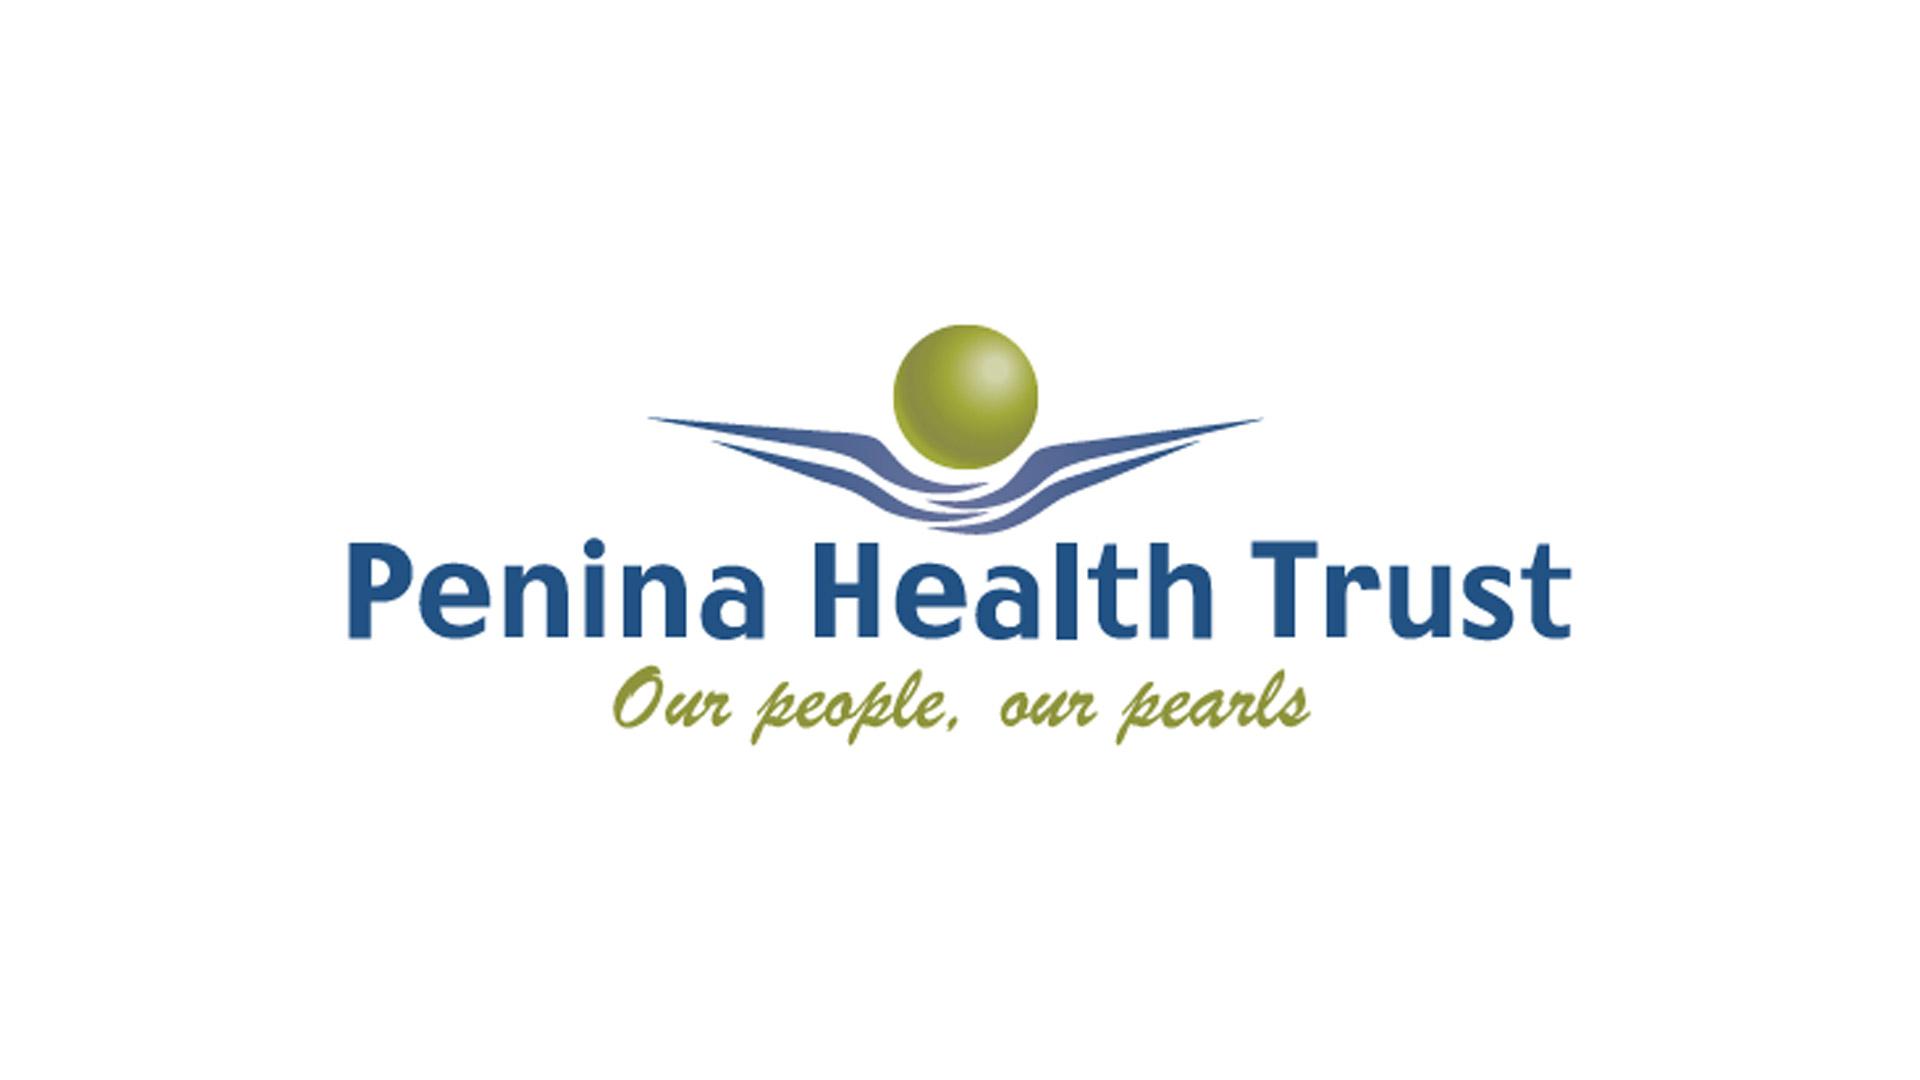 Penina Health Trust